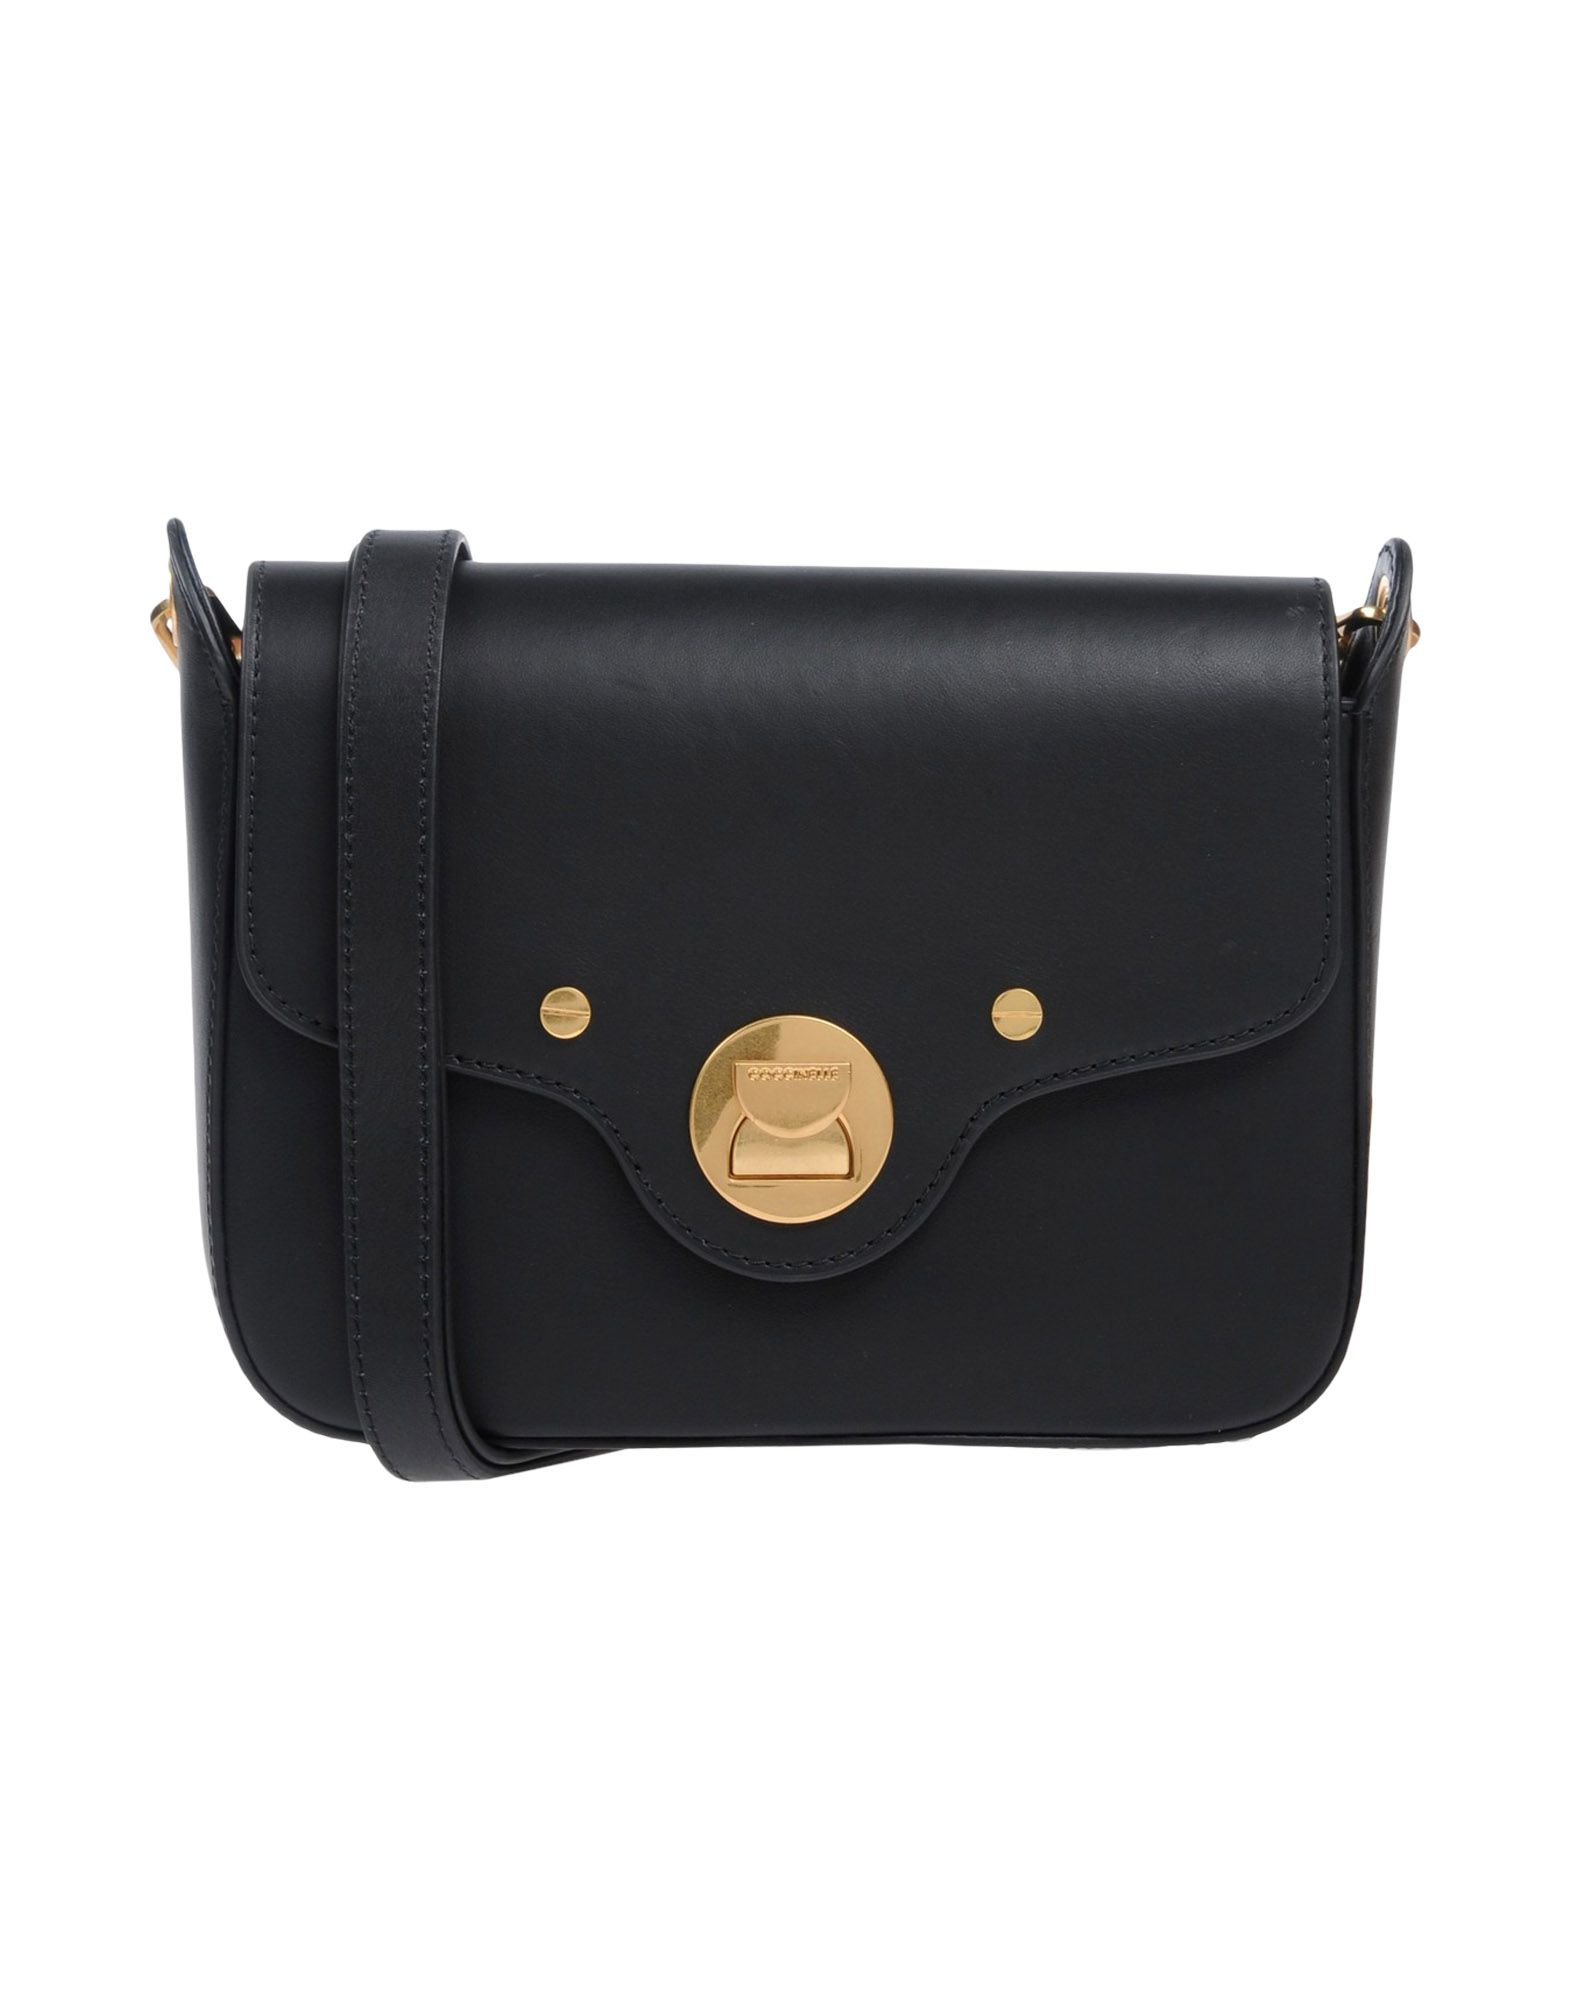 COCCINELLE Сумка через плечо сумка coccinelle c5 yv3 15 37 01 012